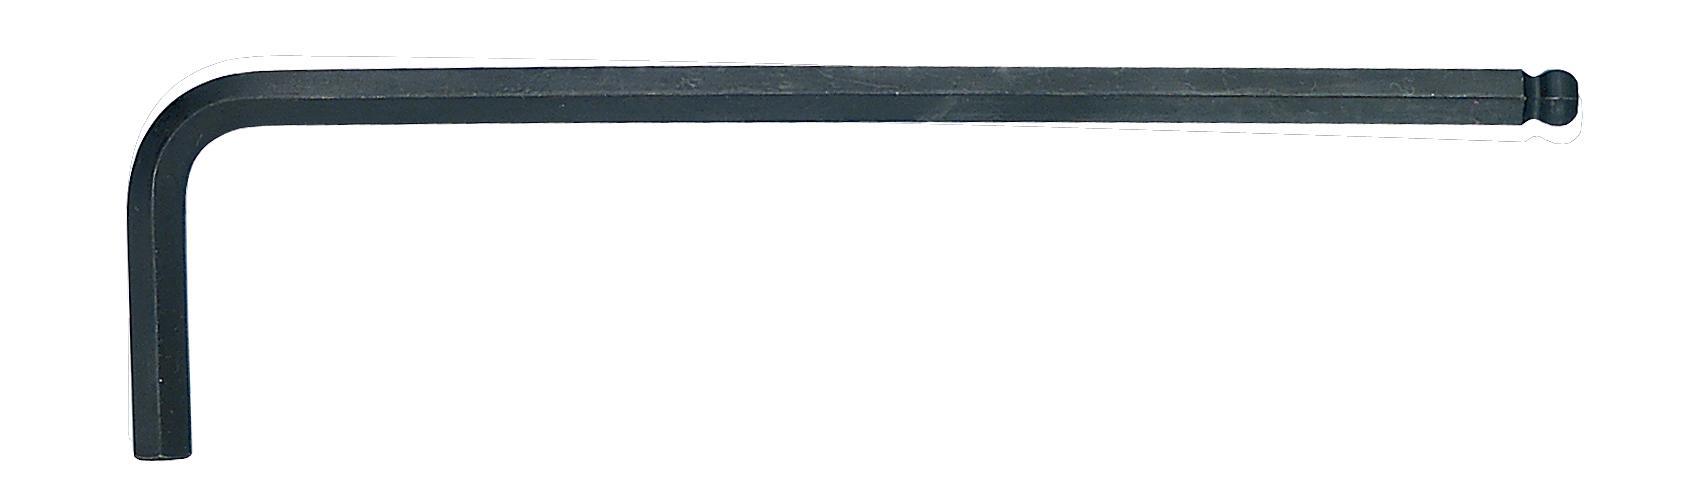 Ключ Felo 35505000